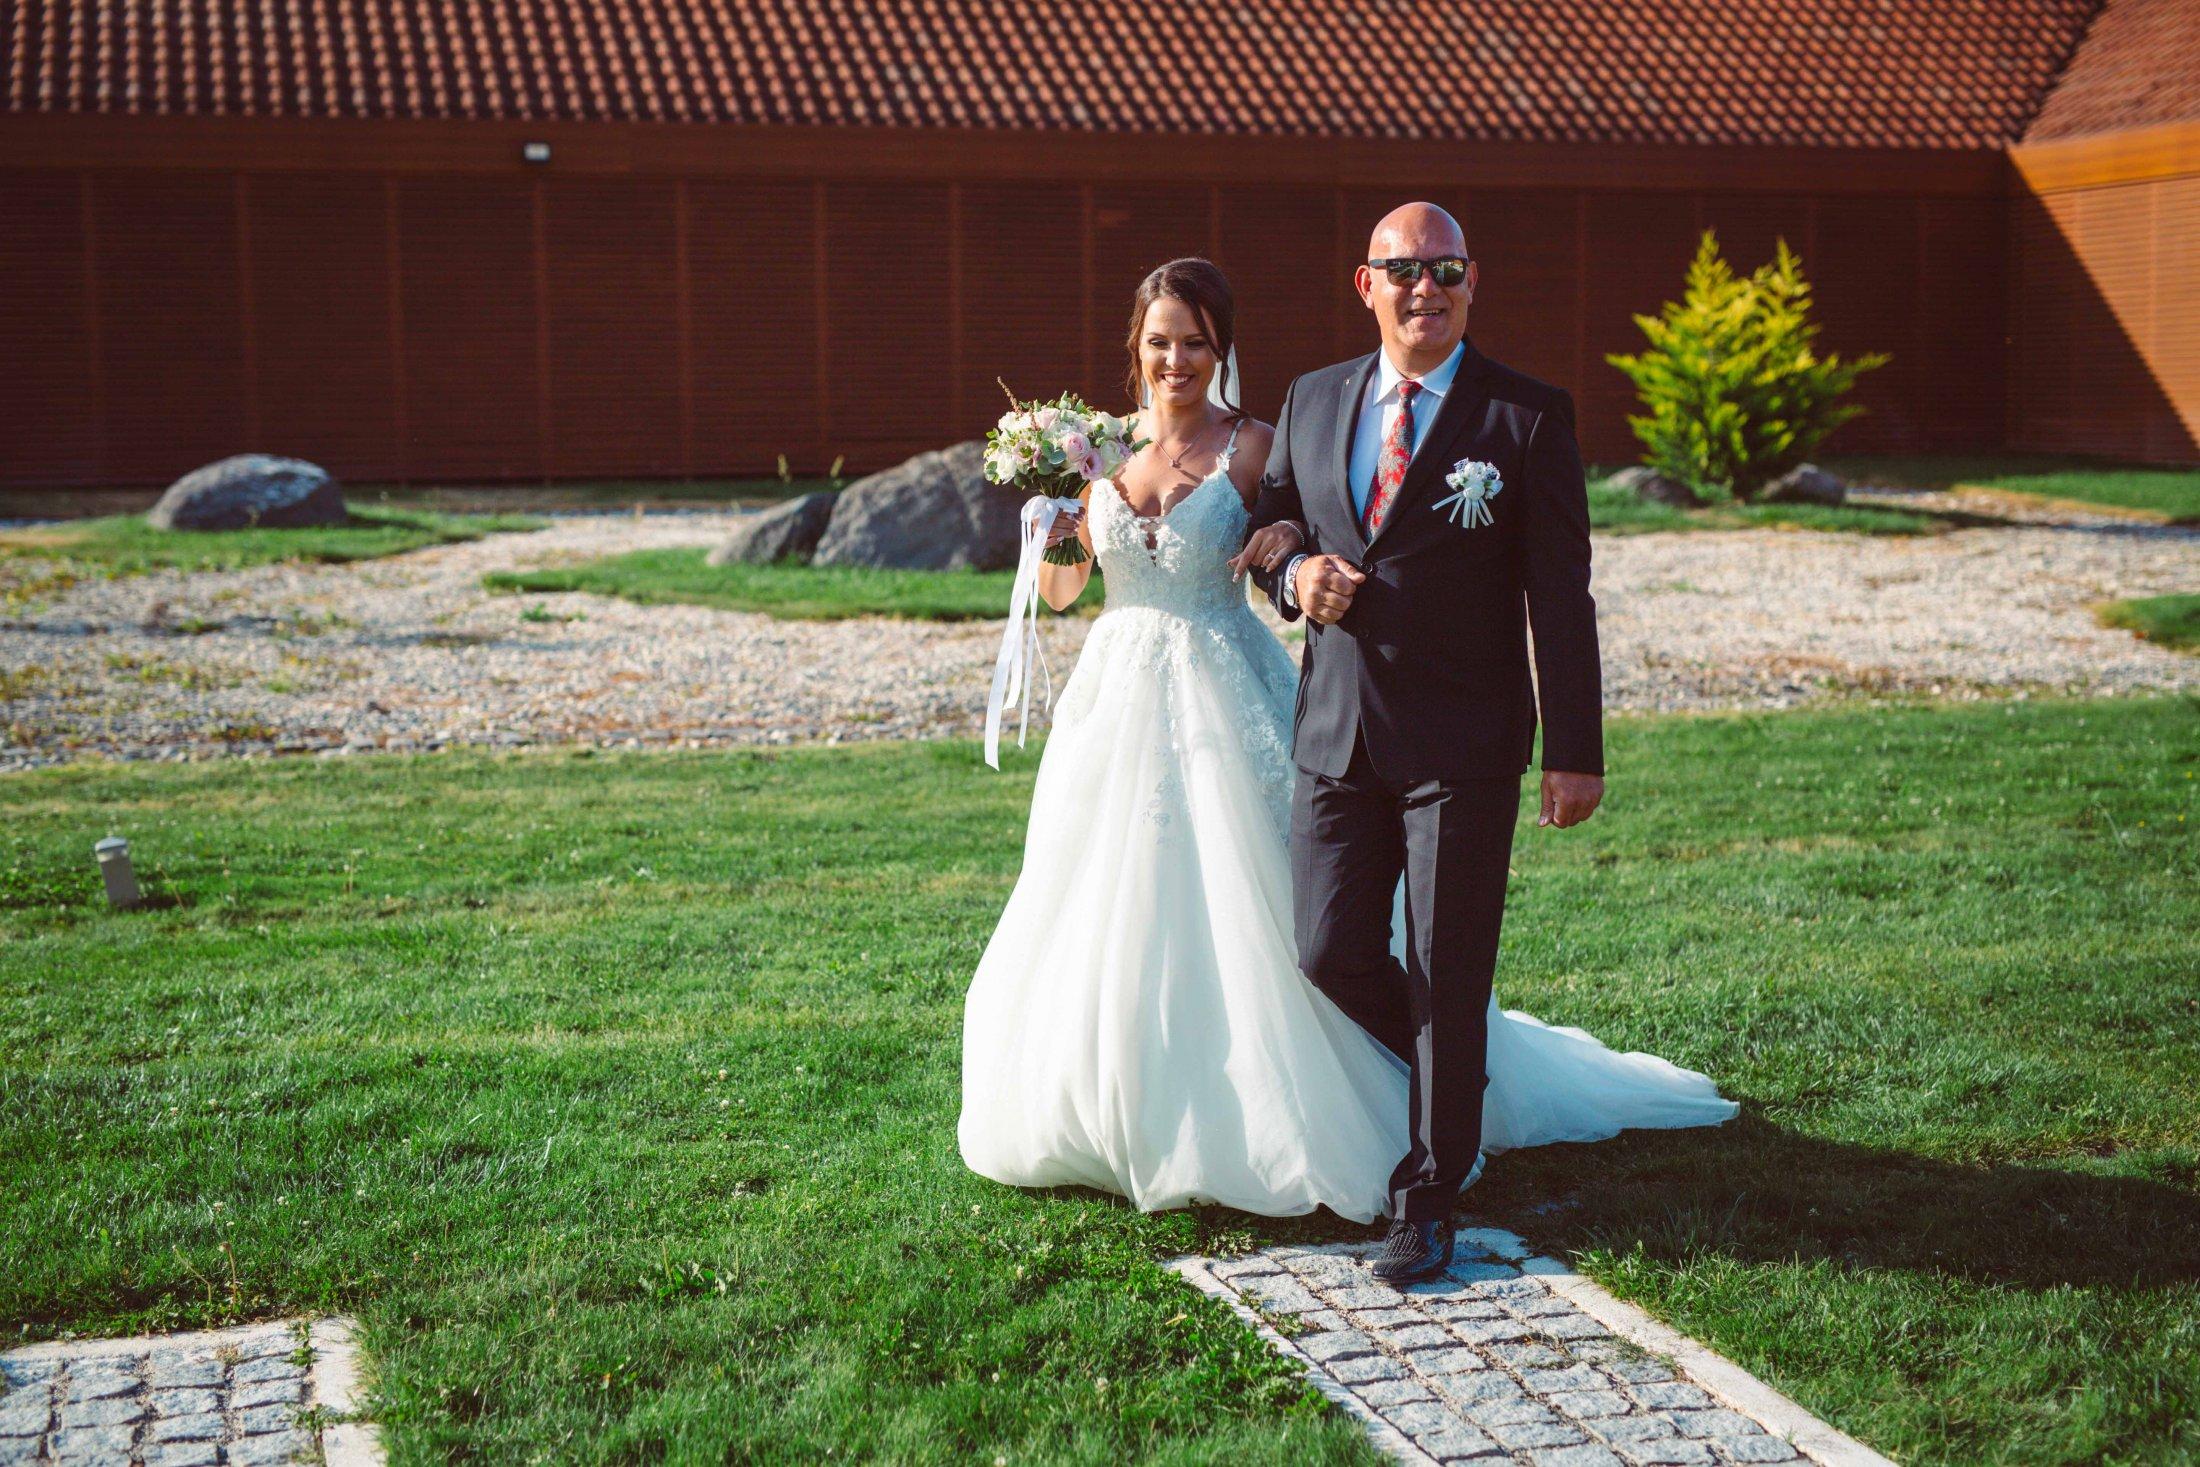 фотография - Маргарита и Мартин, Мидалидаре, svatebn fotograf 55